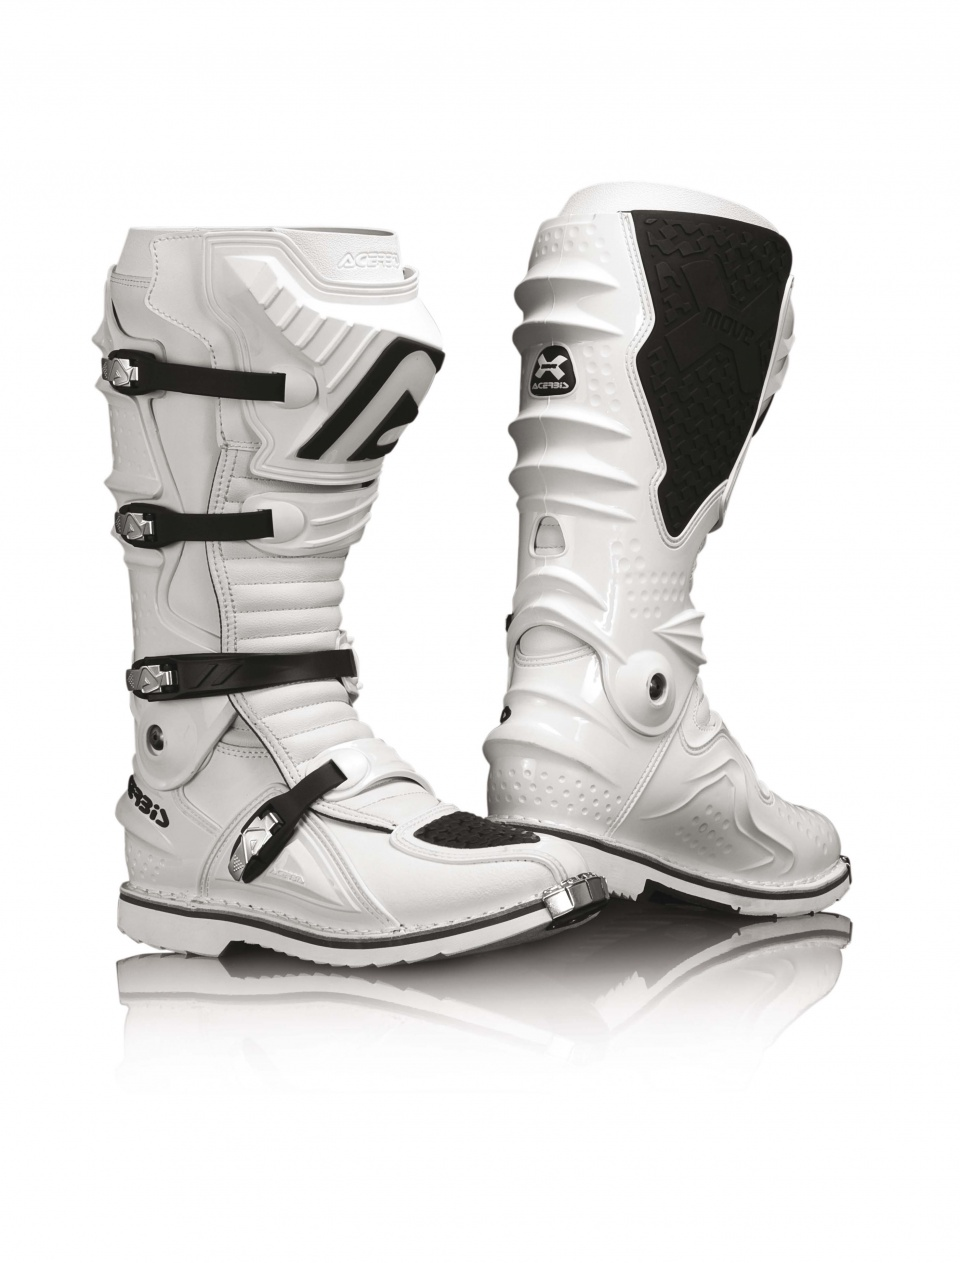 Stivali Motocross Acerbis X-move Bianco